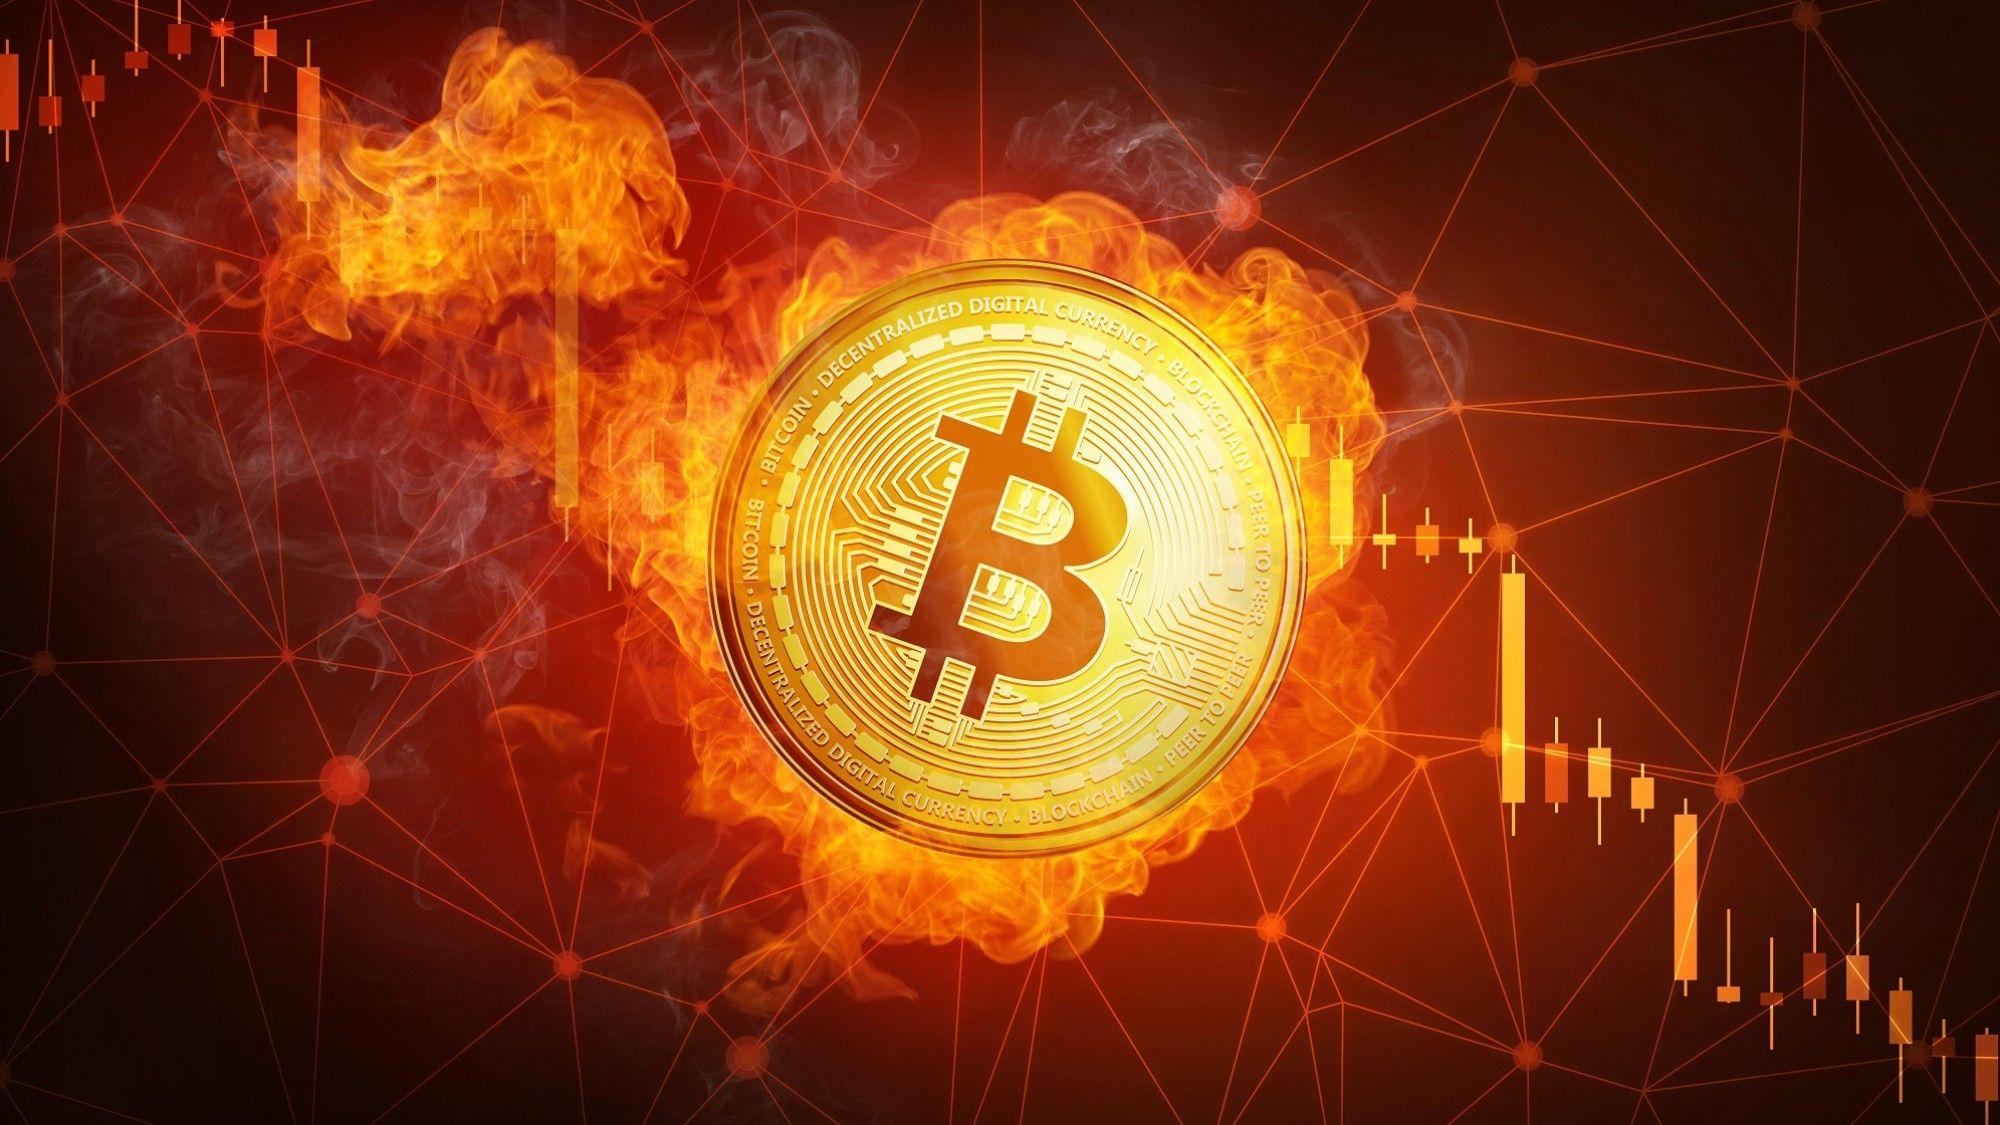 Kemerlerinizi Baglayin Kidemli Analistten 37 Bin Dolarlik Carpici Bitcoin Tahmini